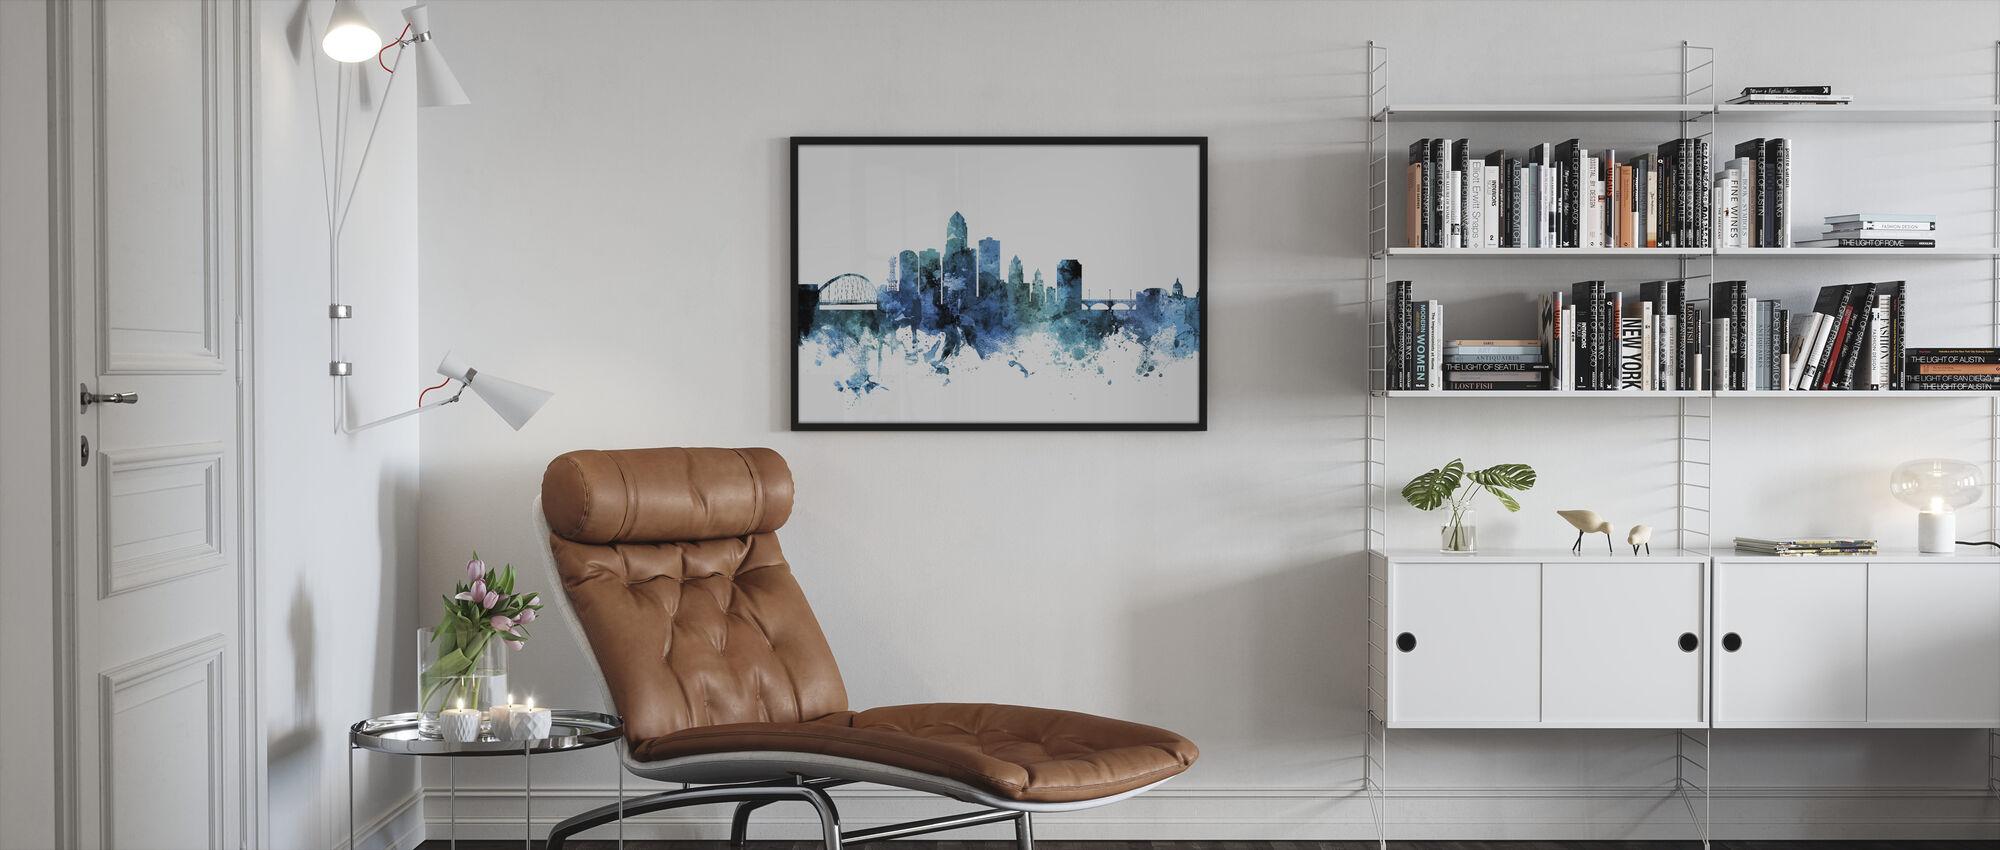 Des Moines Iowa Skyline - Framed print - Living Room